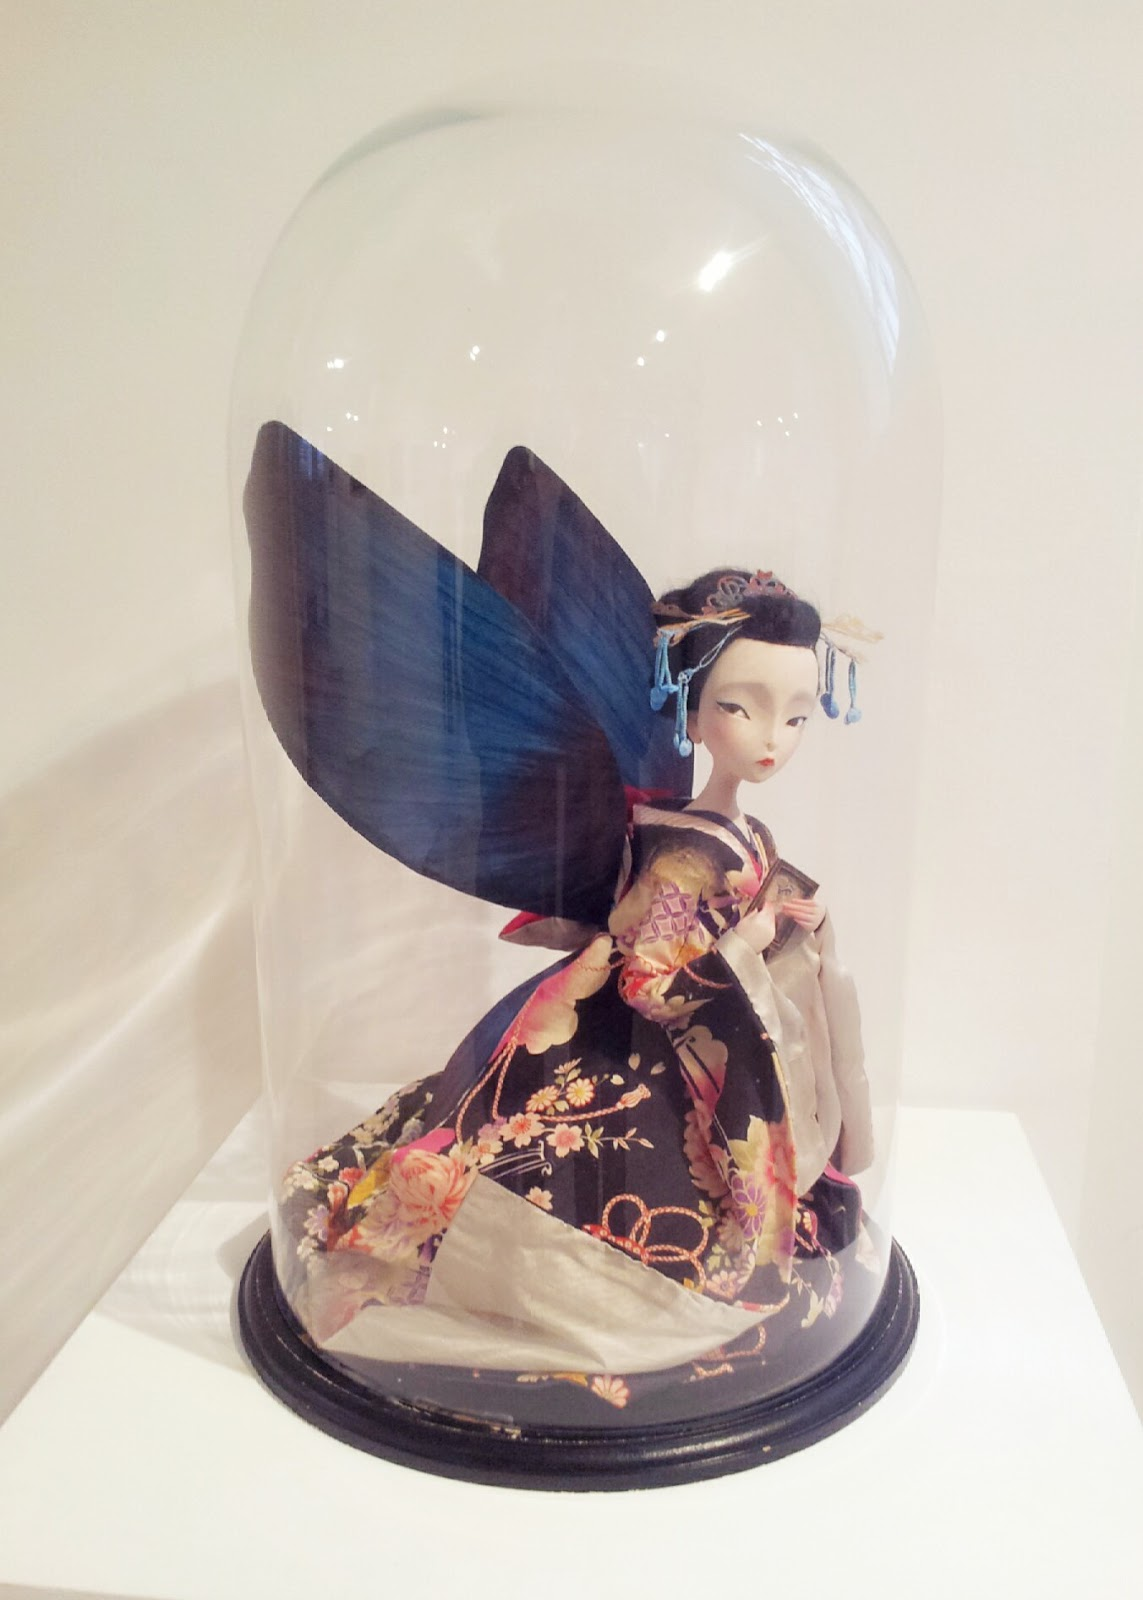 Escultura de Madame Butterfly - Benjamin Lacombe